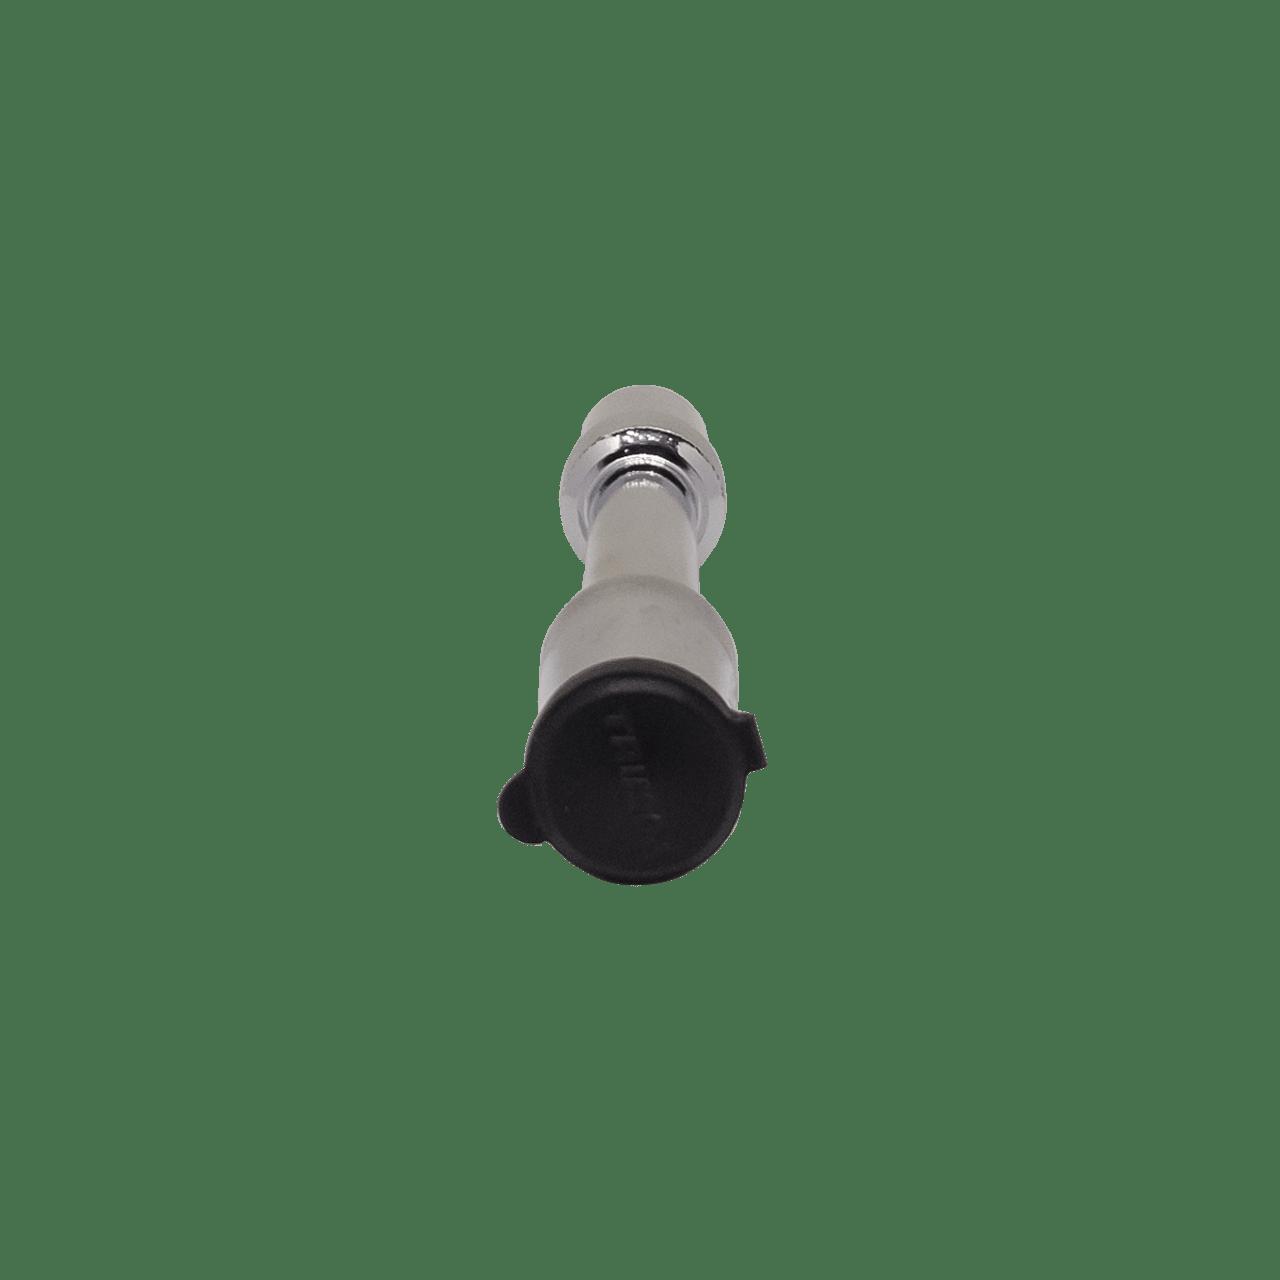 BX88177 --- Blue Ox Tow Bar 4 Lock Kit - Keyed Alike